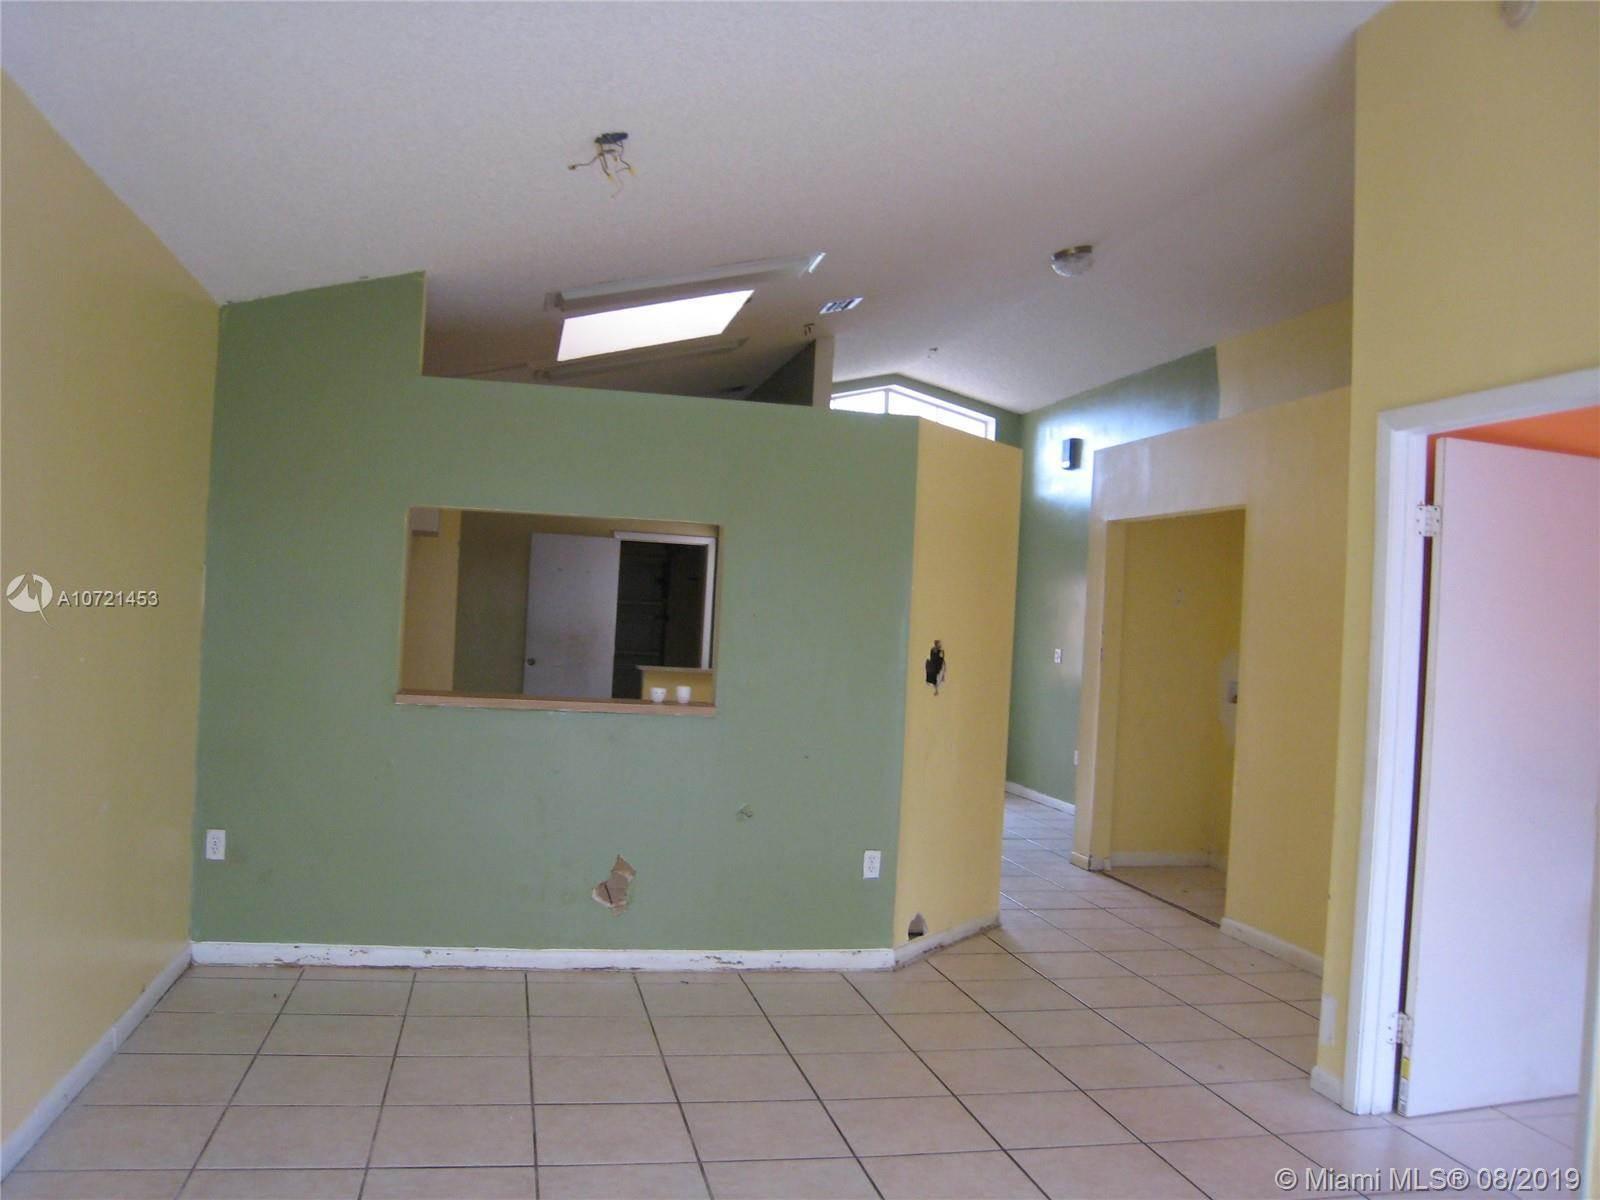 9932 West Elm Ln, Miramar, FL 33025